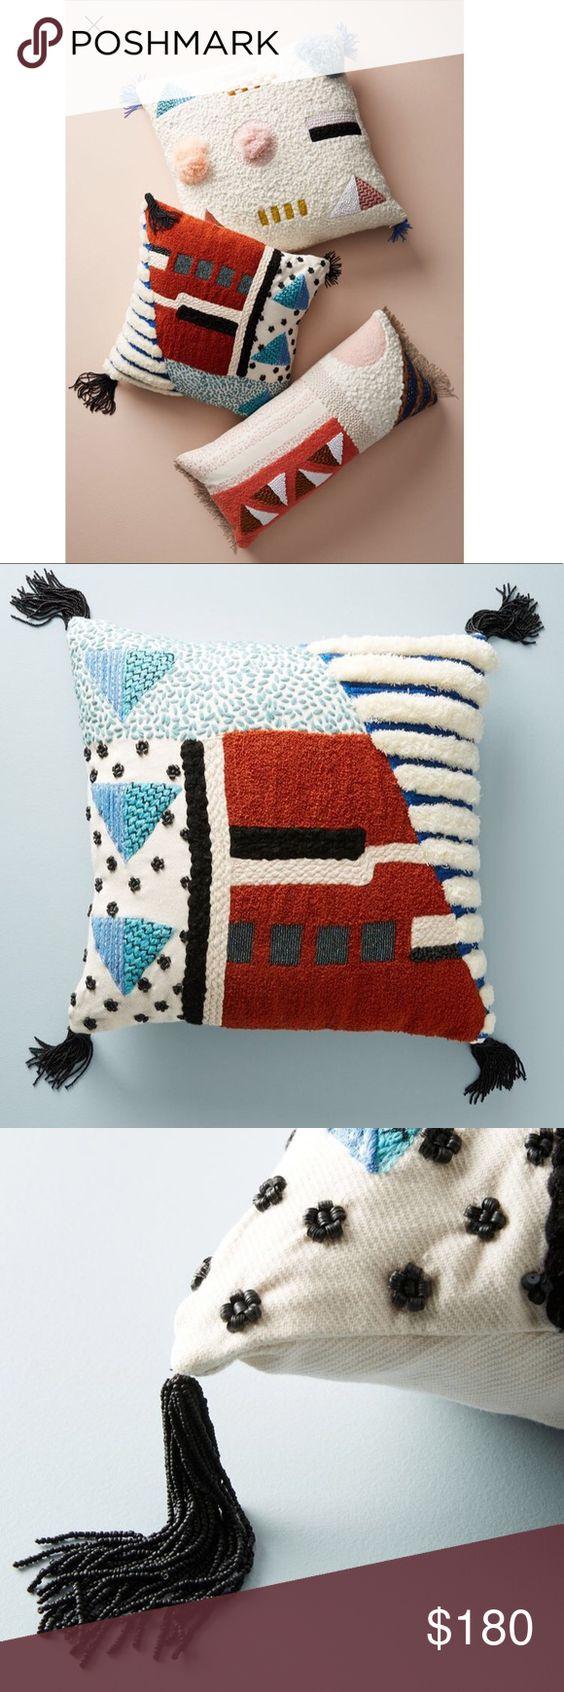 Adorable Trending Set Pillows